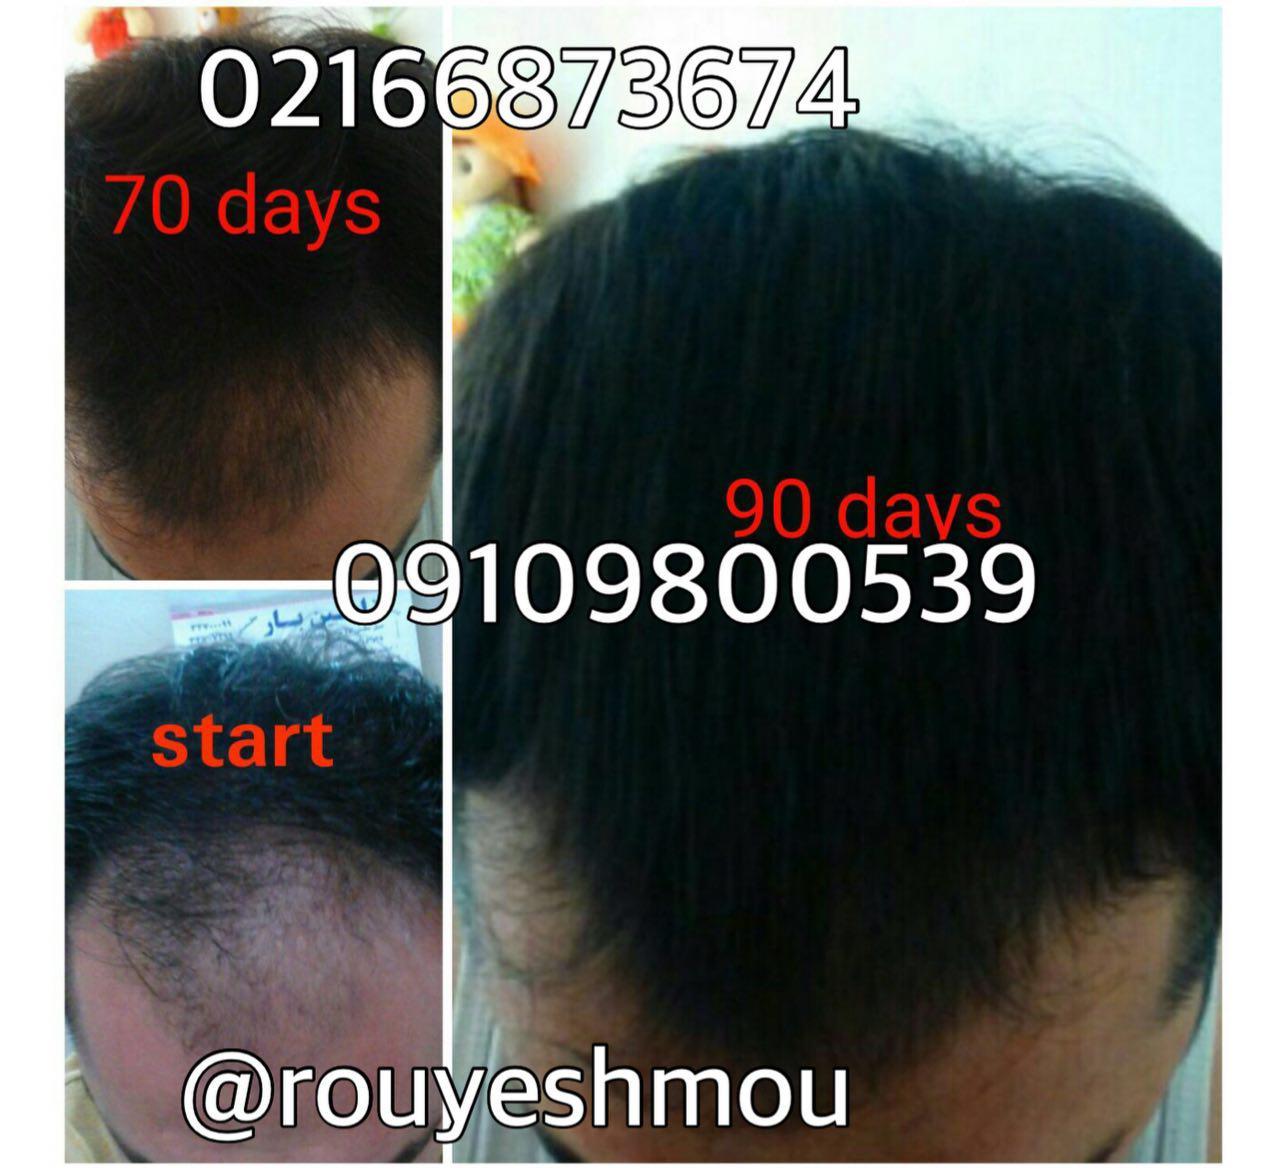 photo 2017 11 05 19 38 06 - روش های افزایش رشد مو دکترنوروزیان